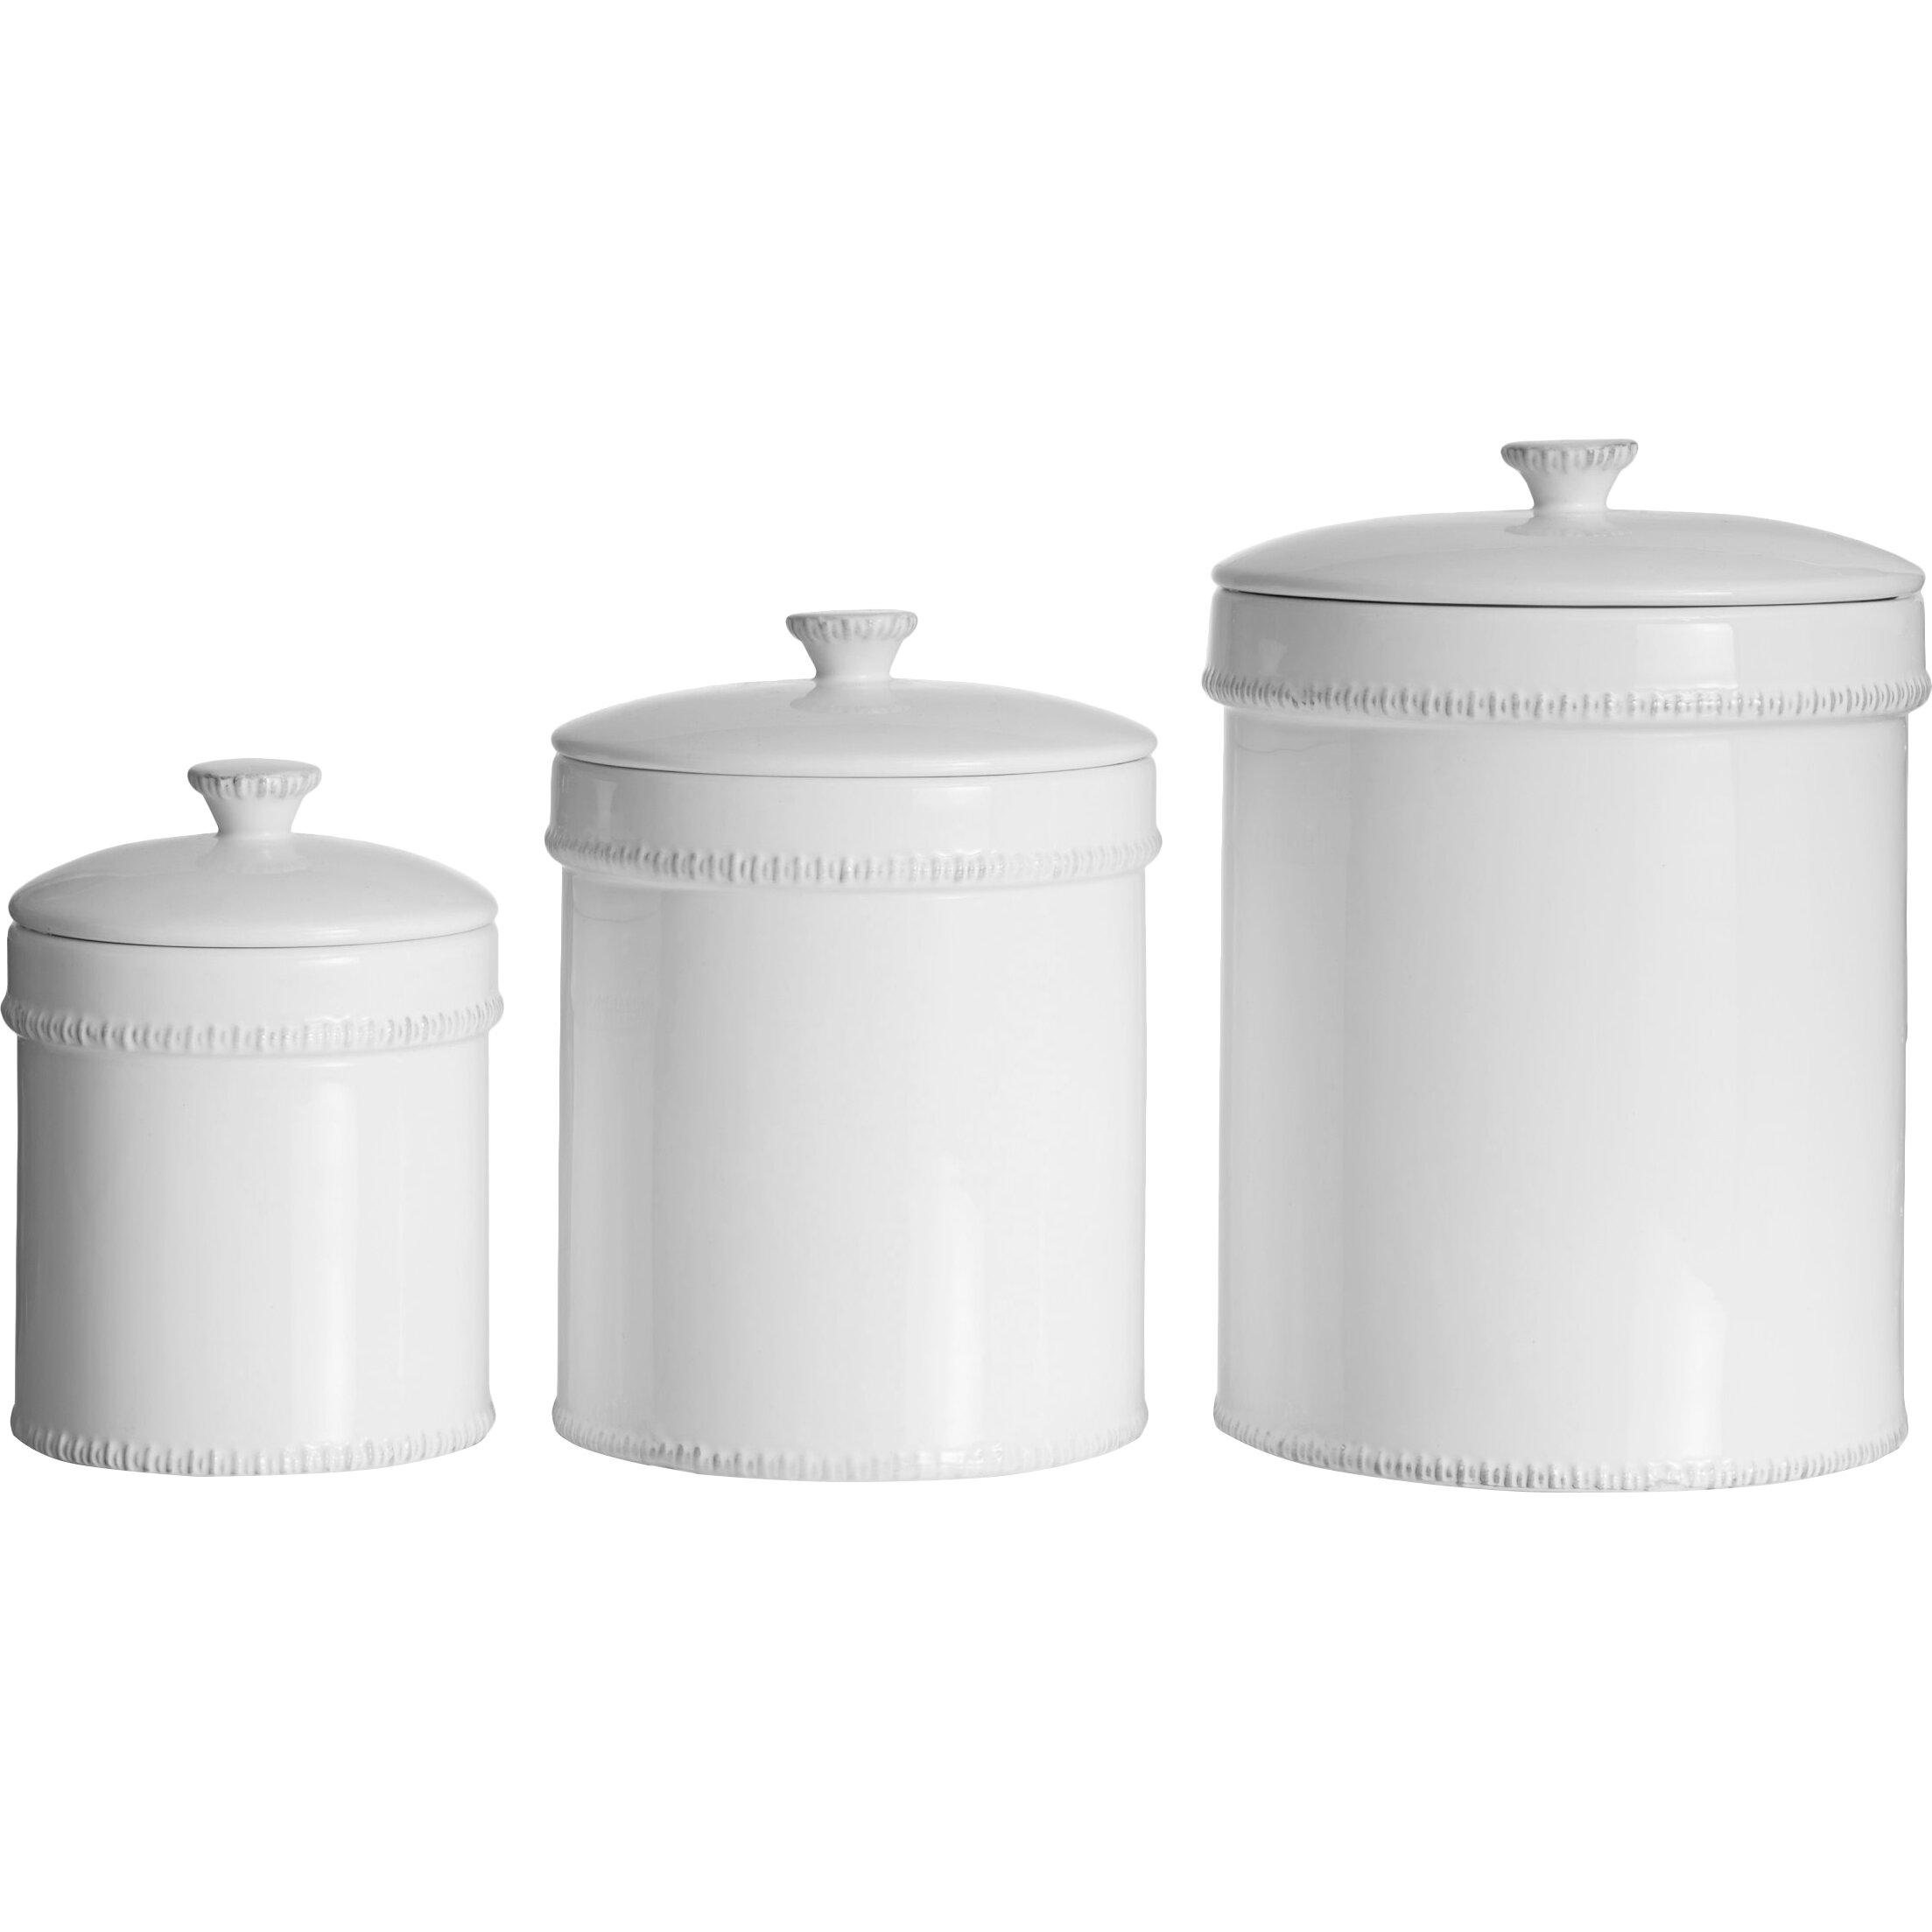 ... Ceramic Kitchen Canisters Sets 100 Green Kitchen Canister Set Wayfair  Basics Wayfair ...